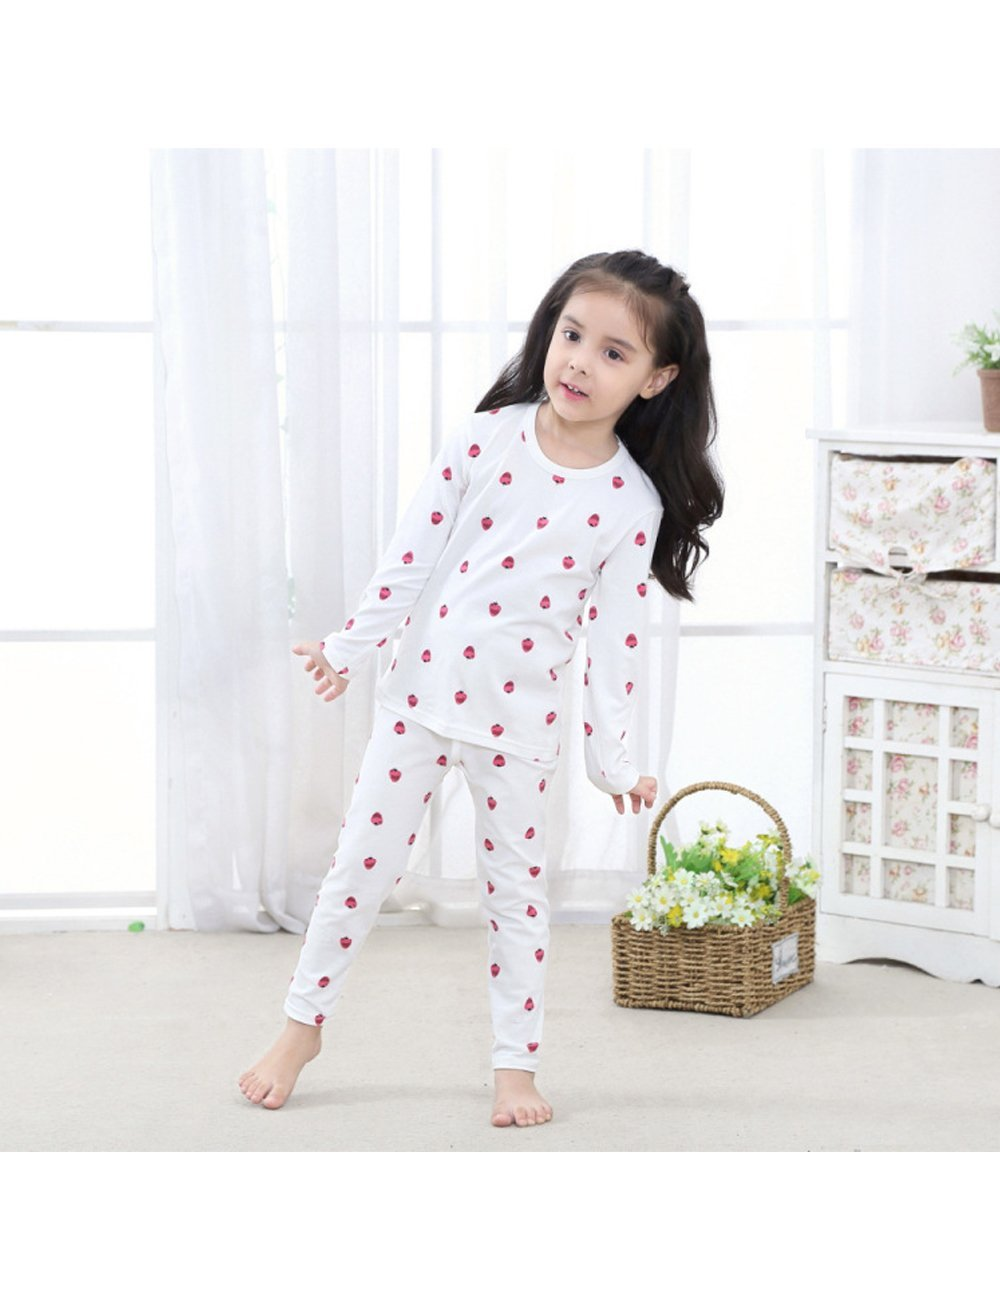 Menschwear Girl's Elastic Thermal Underwear Set Long Top and Bottom (120CM,White) by Menschwear (Image #4)